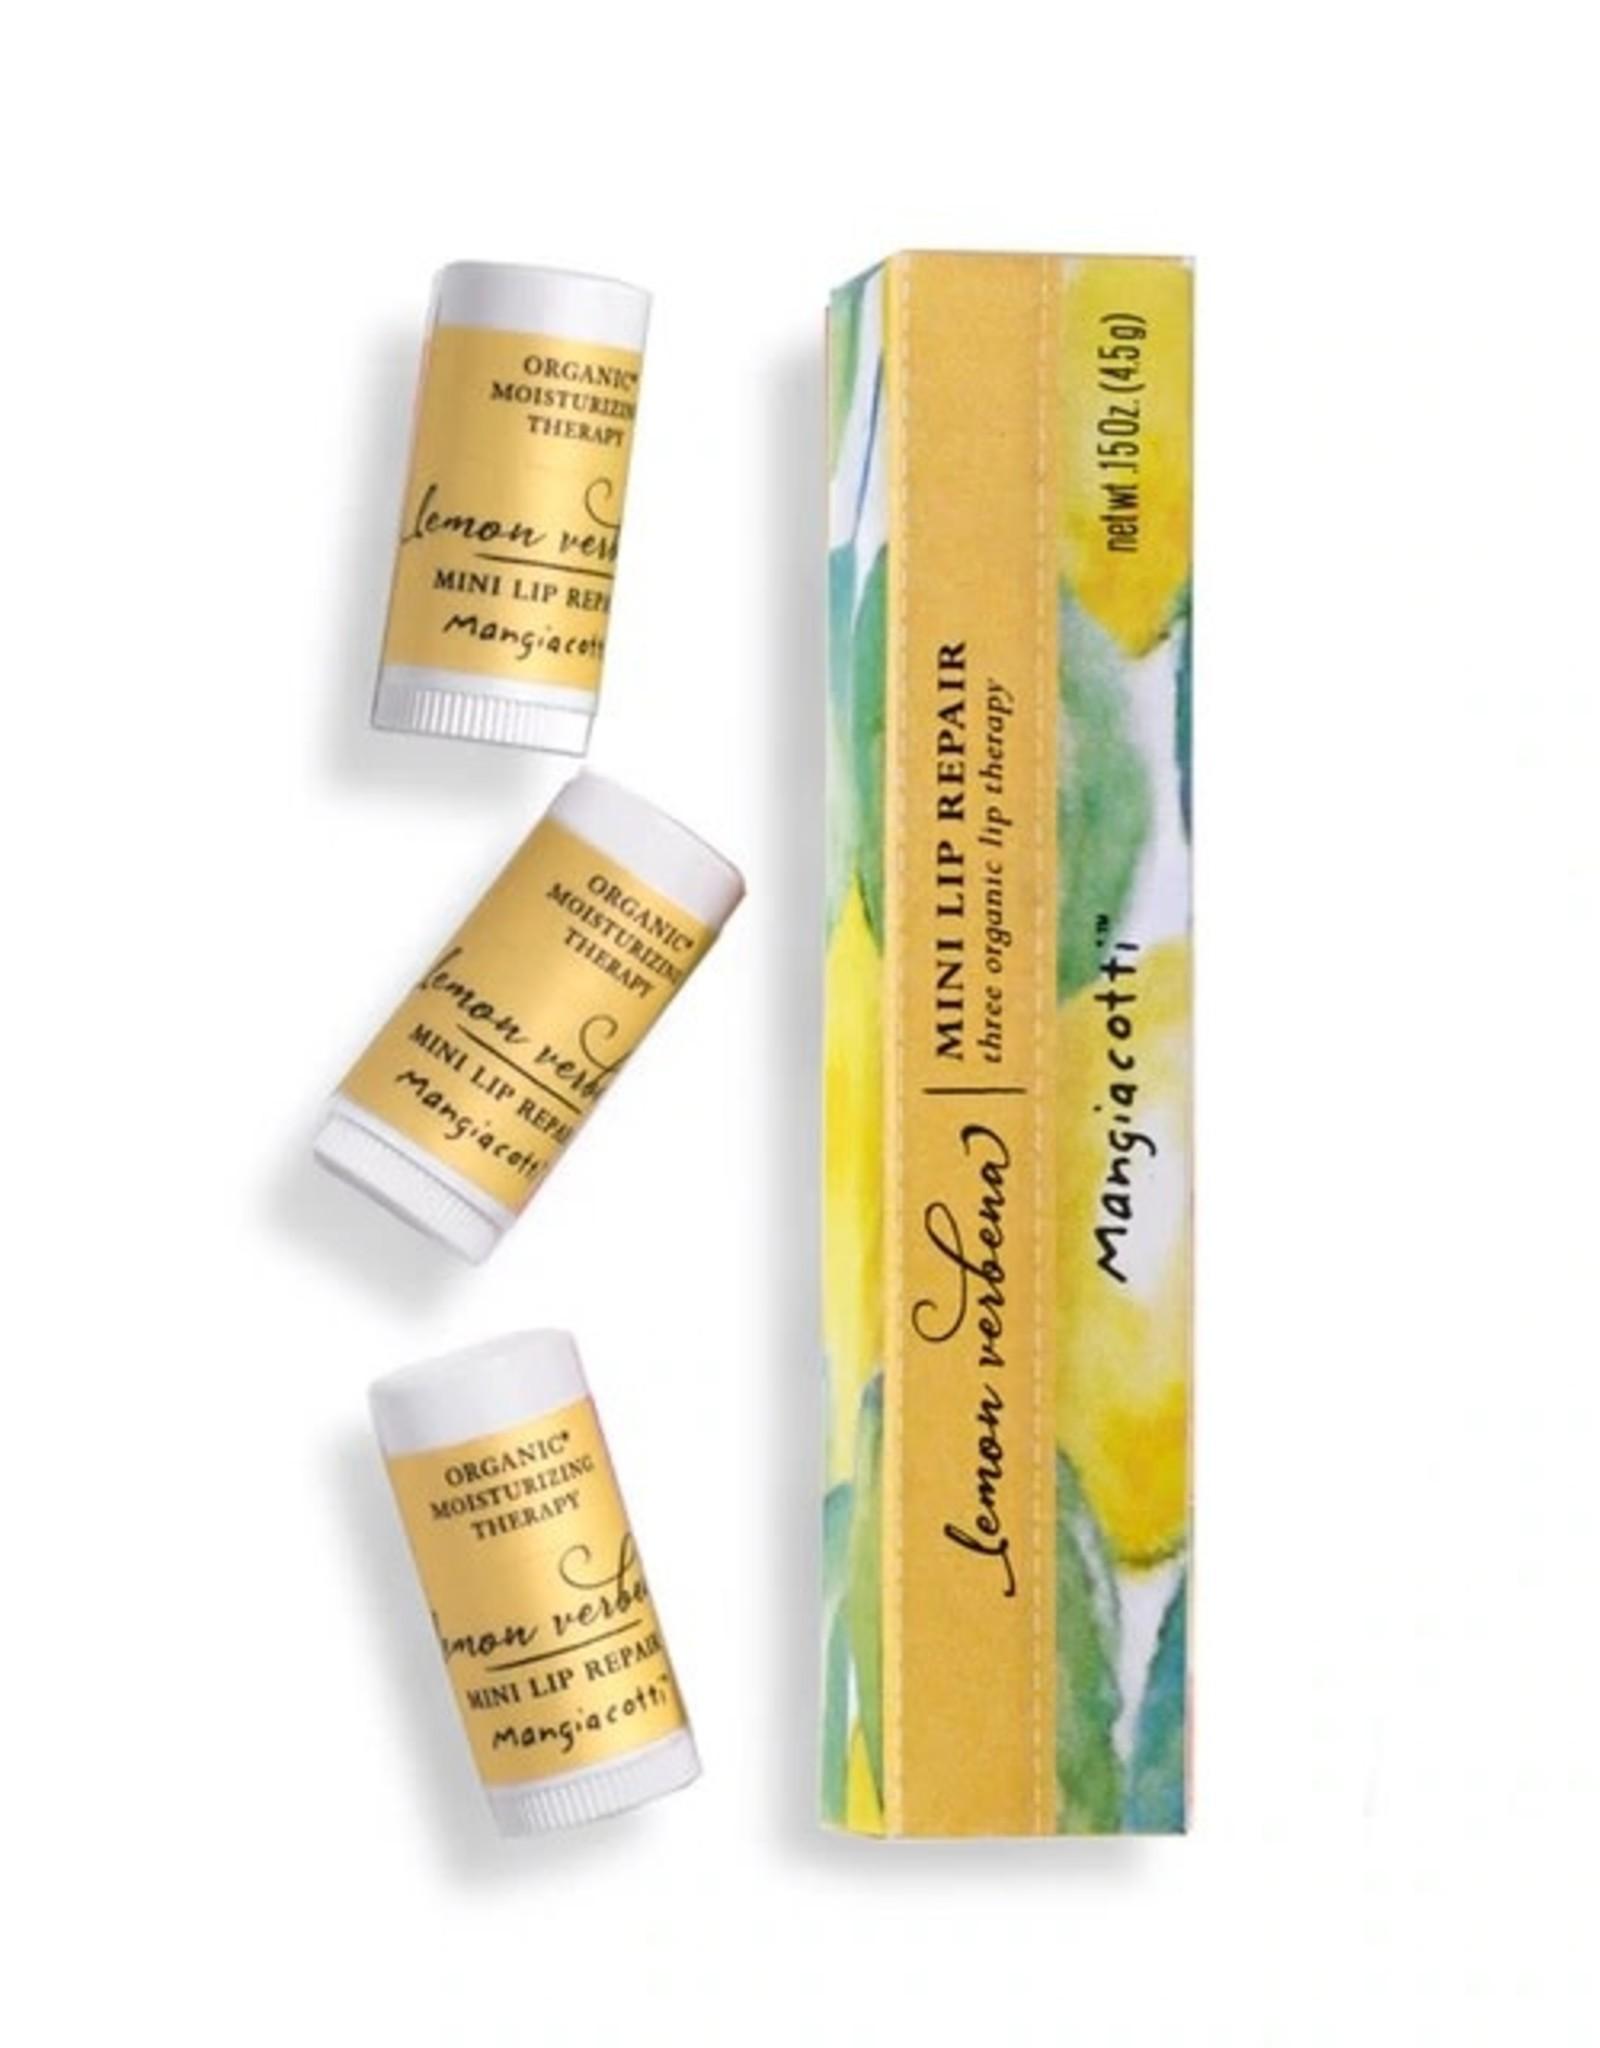 Mangicotti Mangiacotti Lip Repair Lemon Verbena